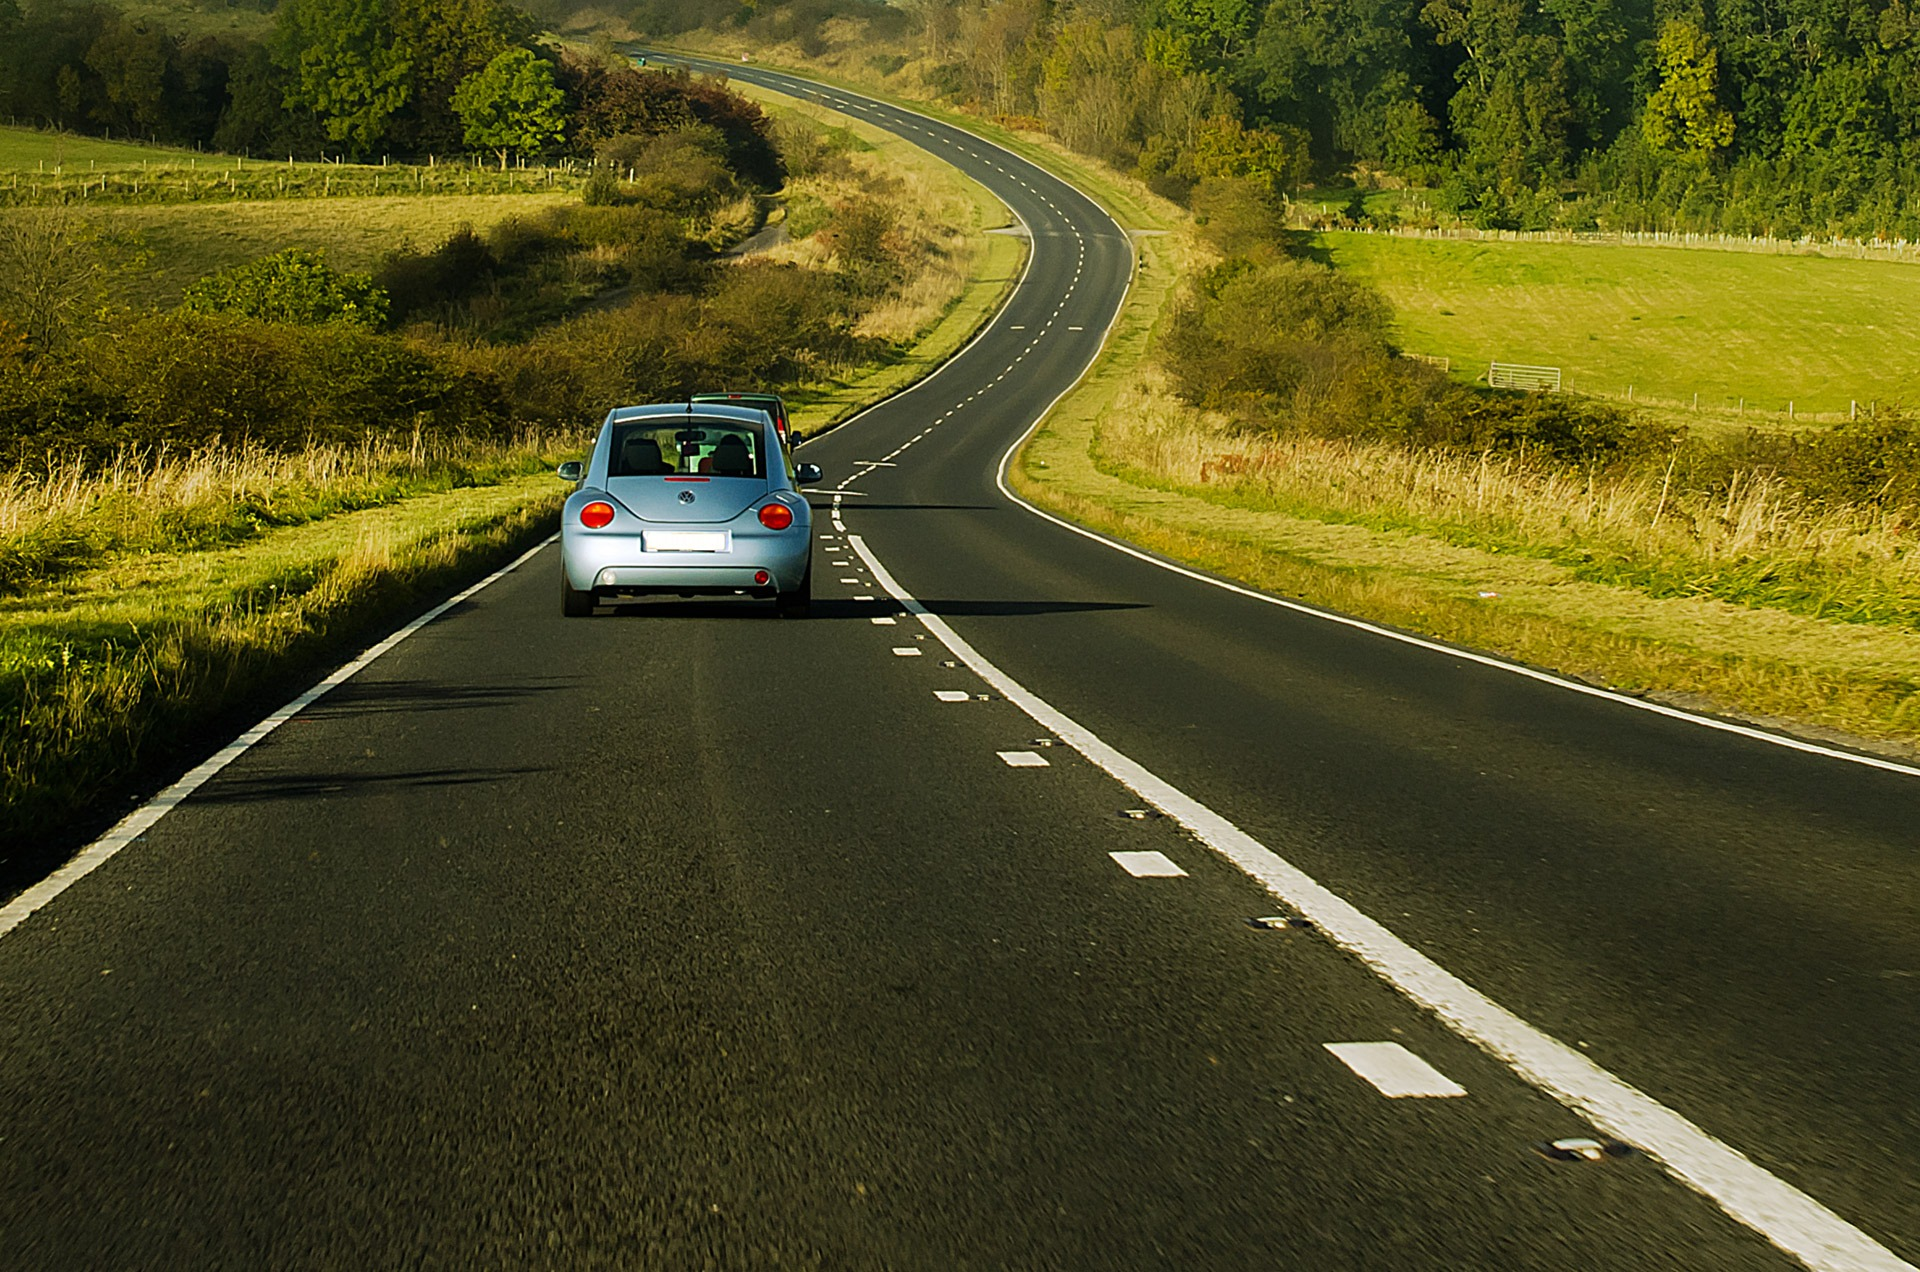 Ekspertas: kalbant telefonu vairuotojo reakcija lėtėja 40 proc.